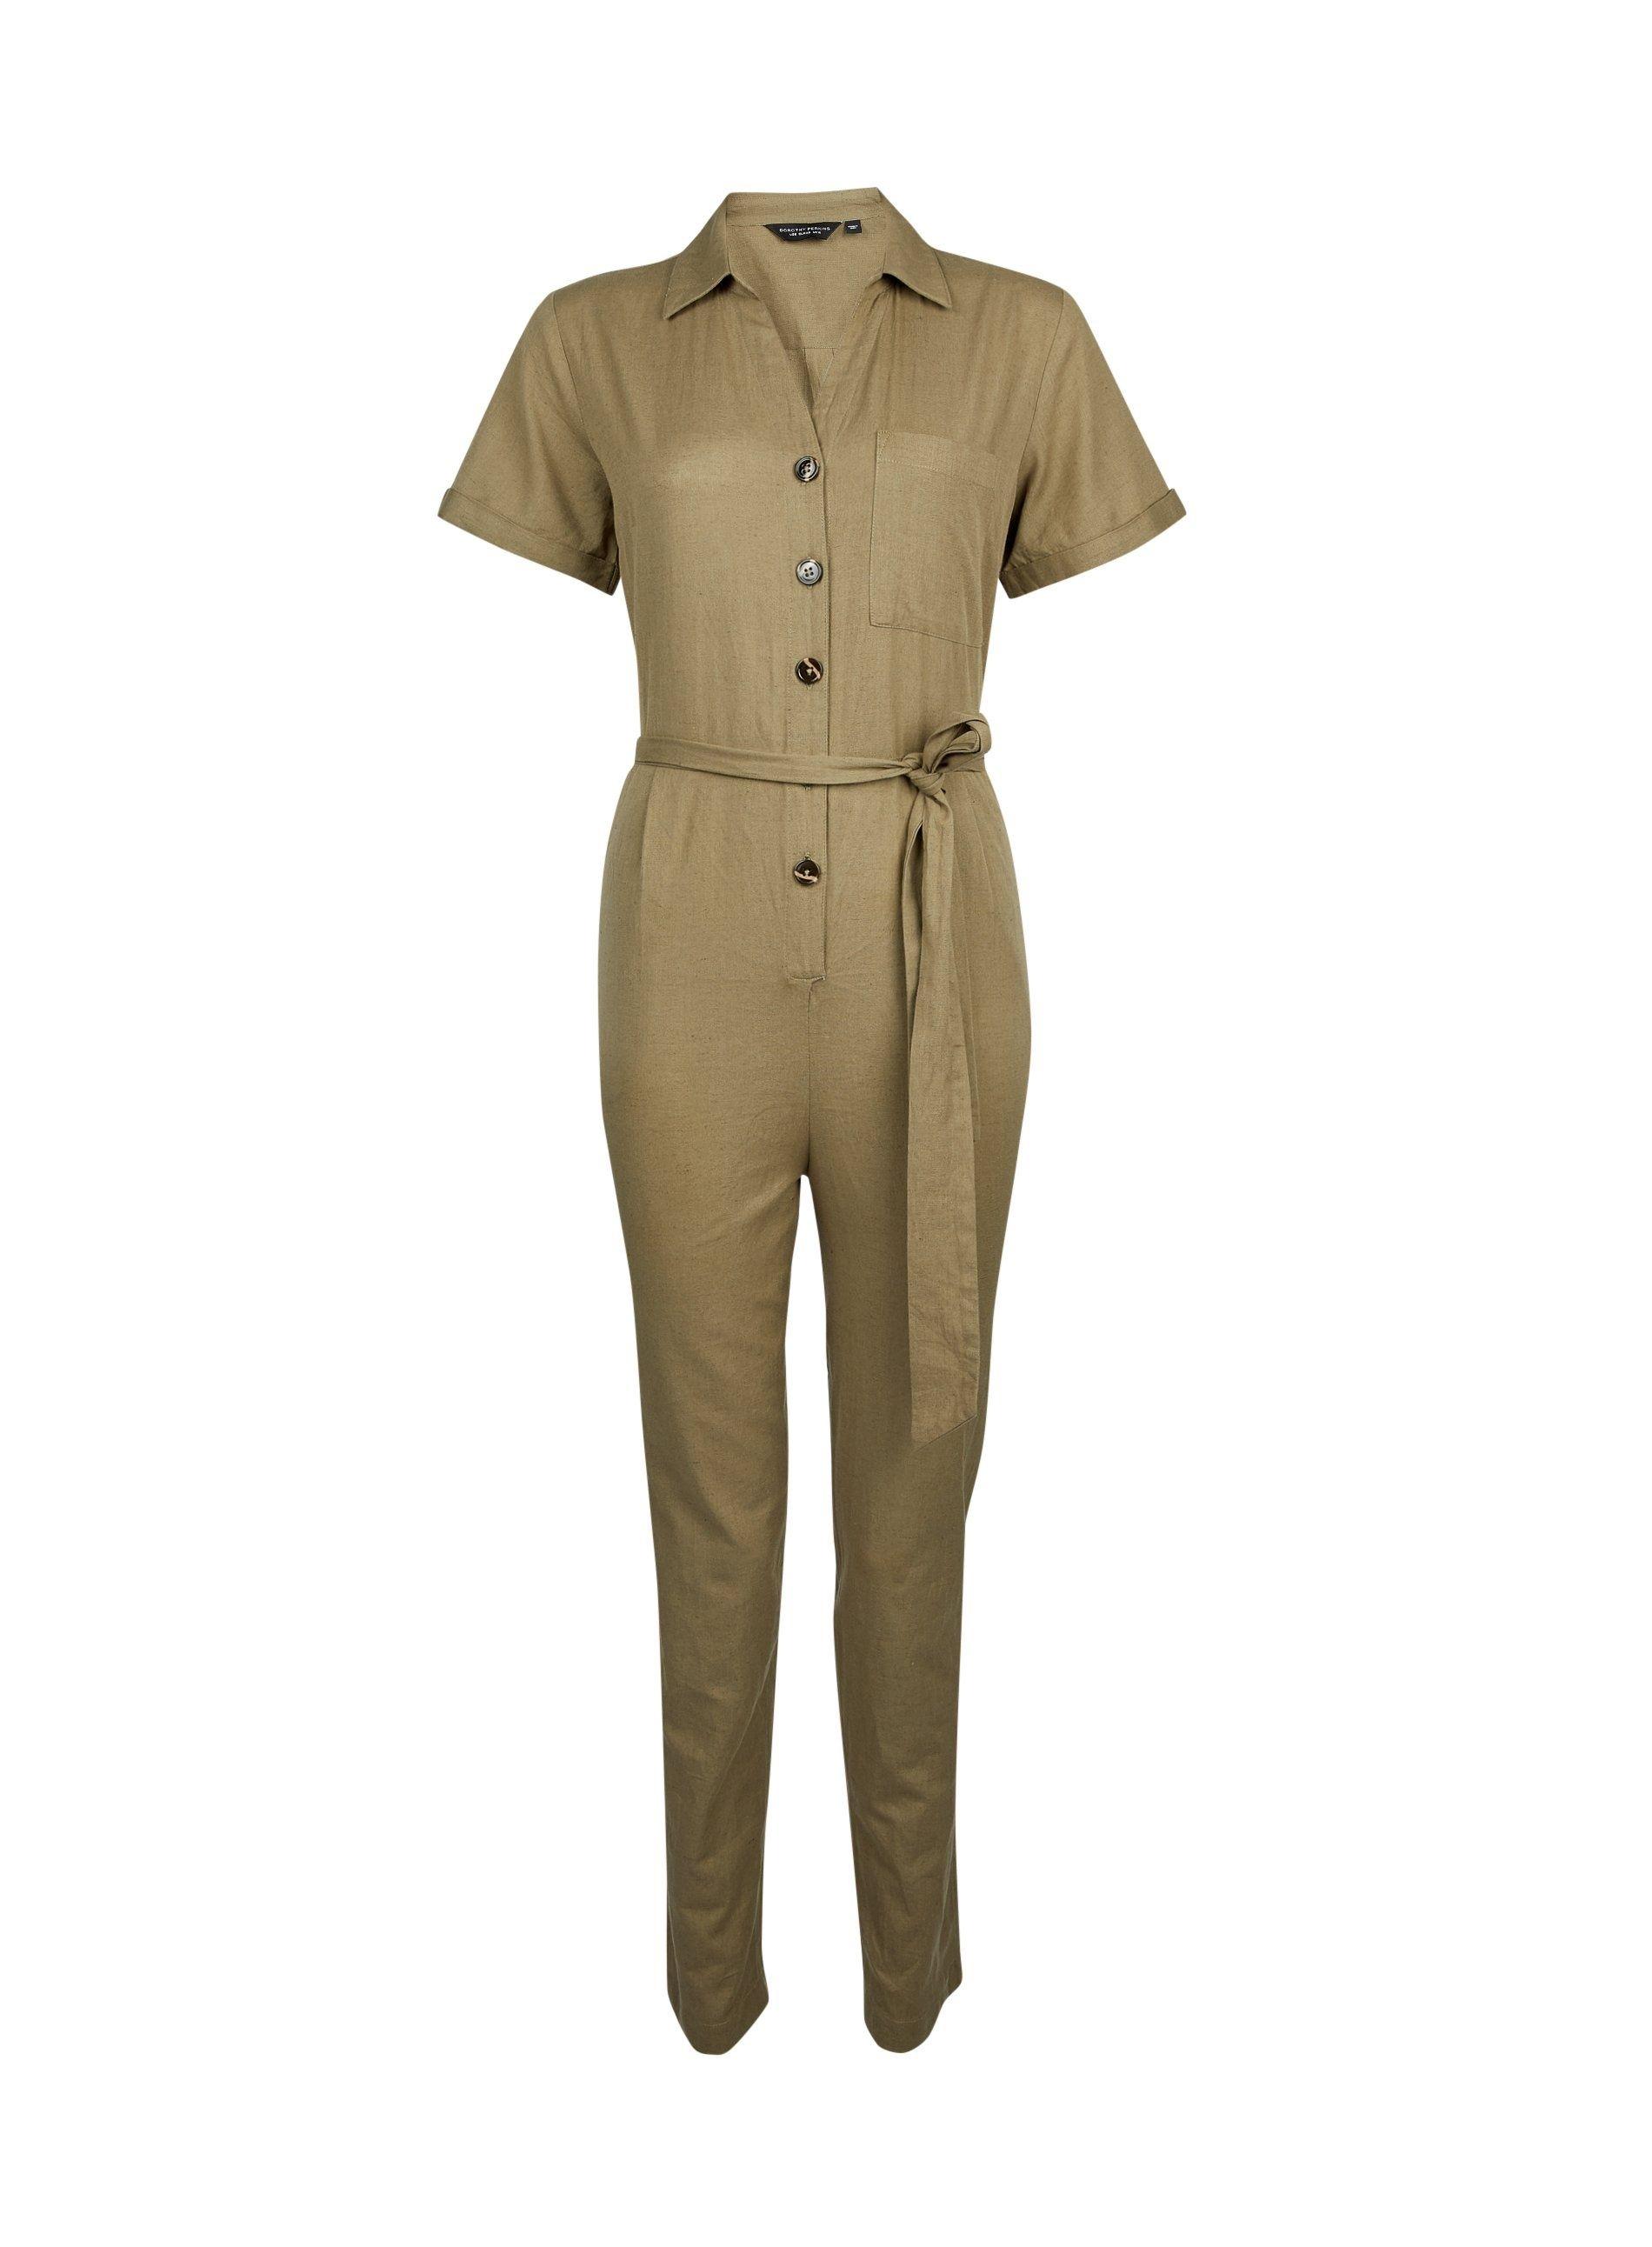 Dorothy Perkins Womens Khaki Utility Jumpsuit V-Neck Short Sleeve Tie Waist